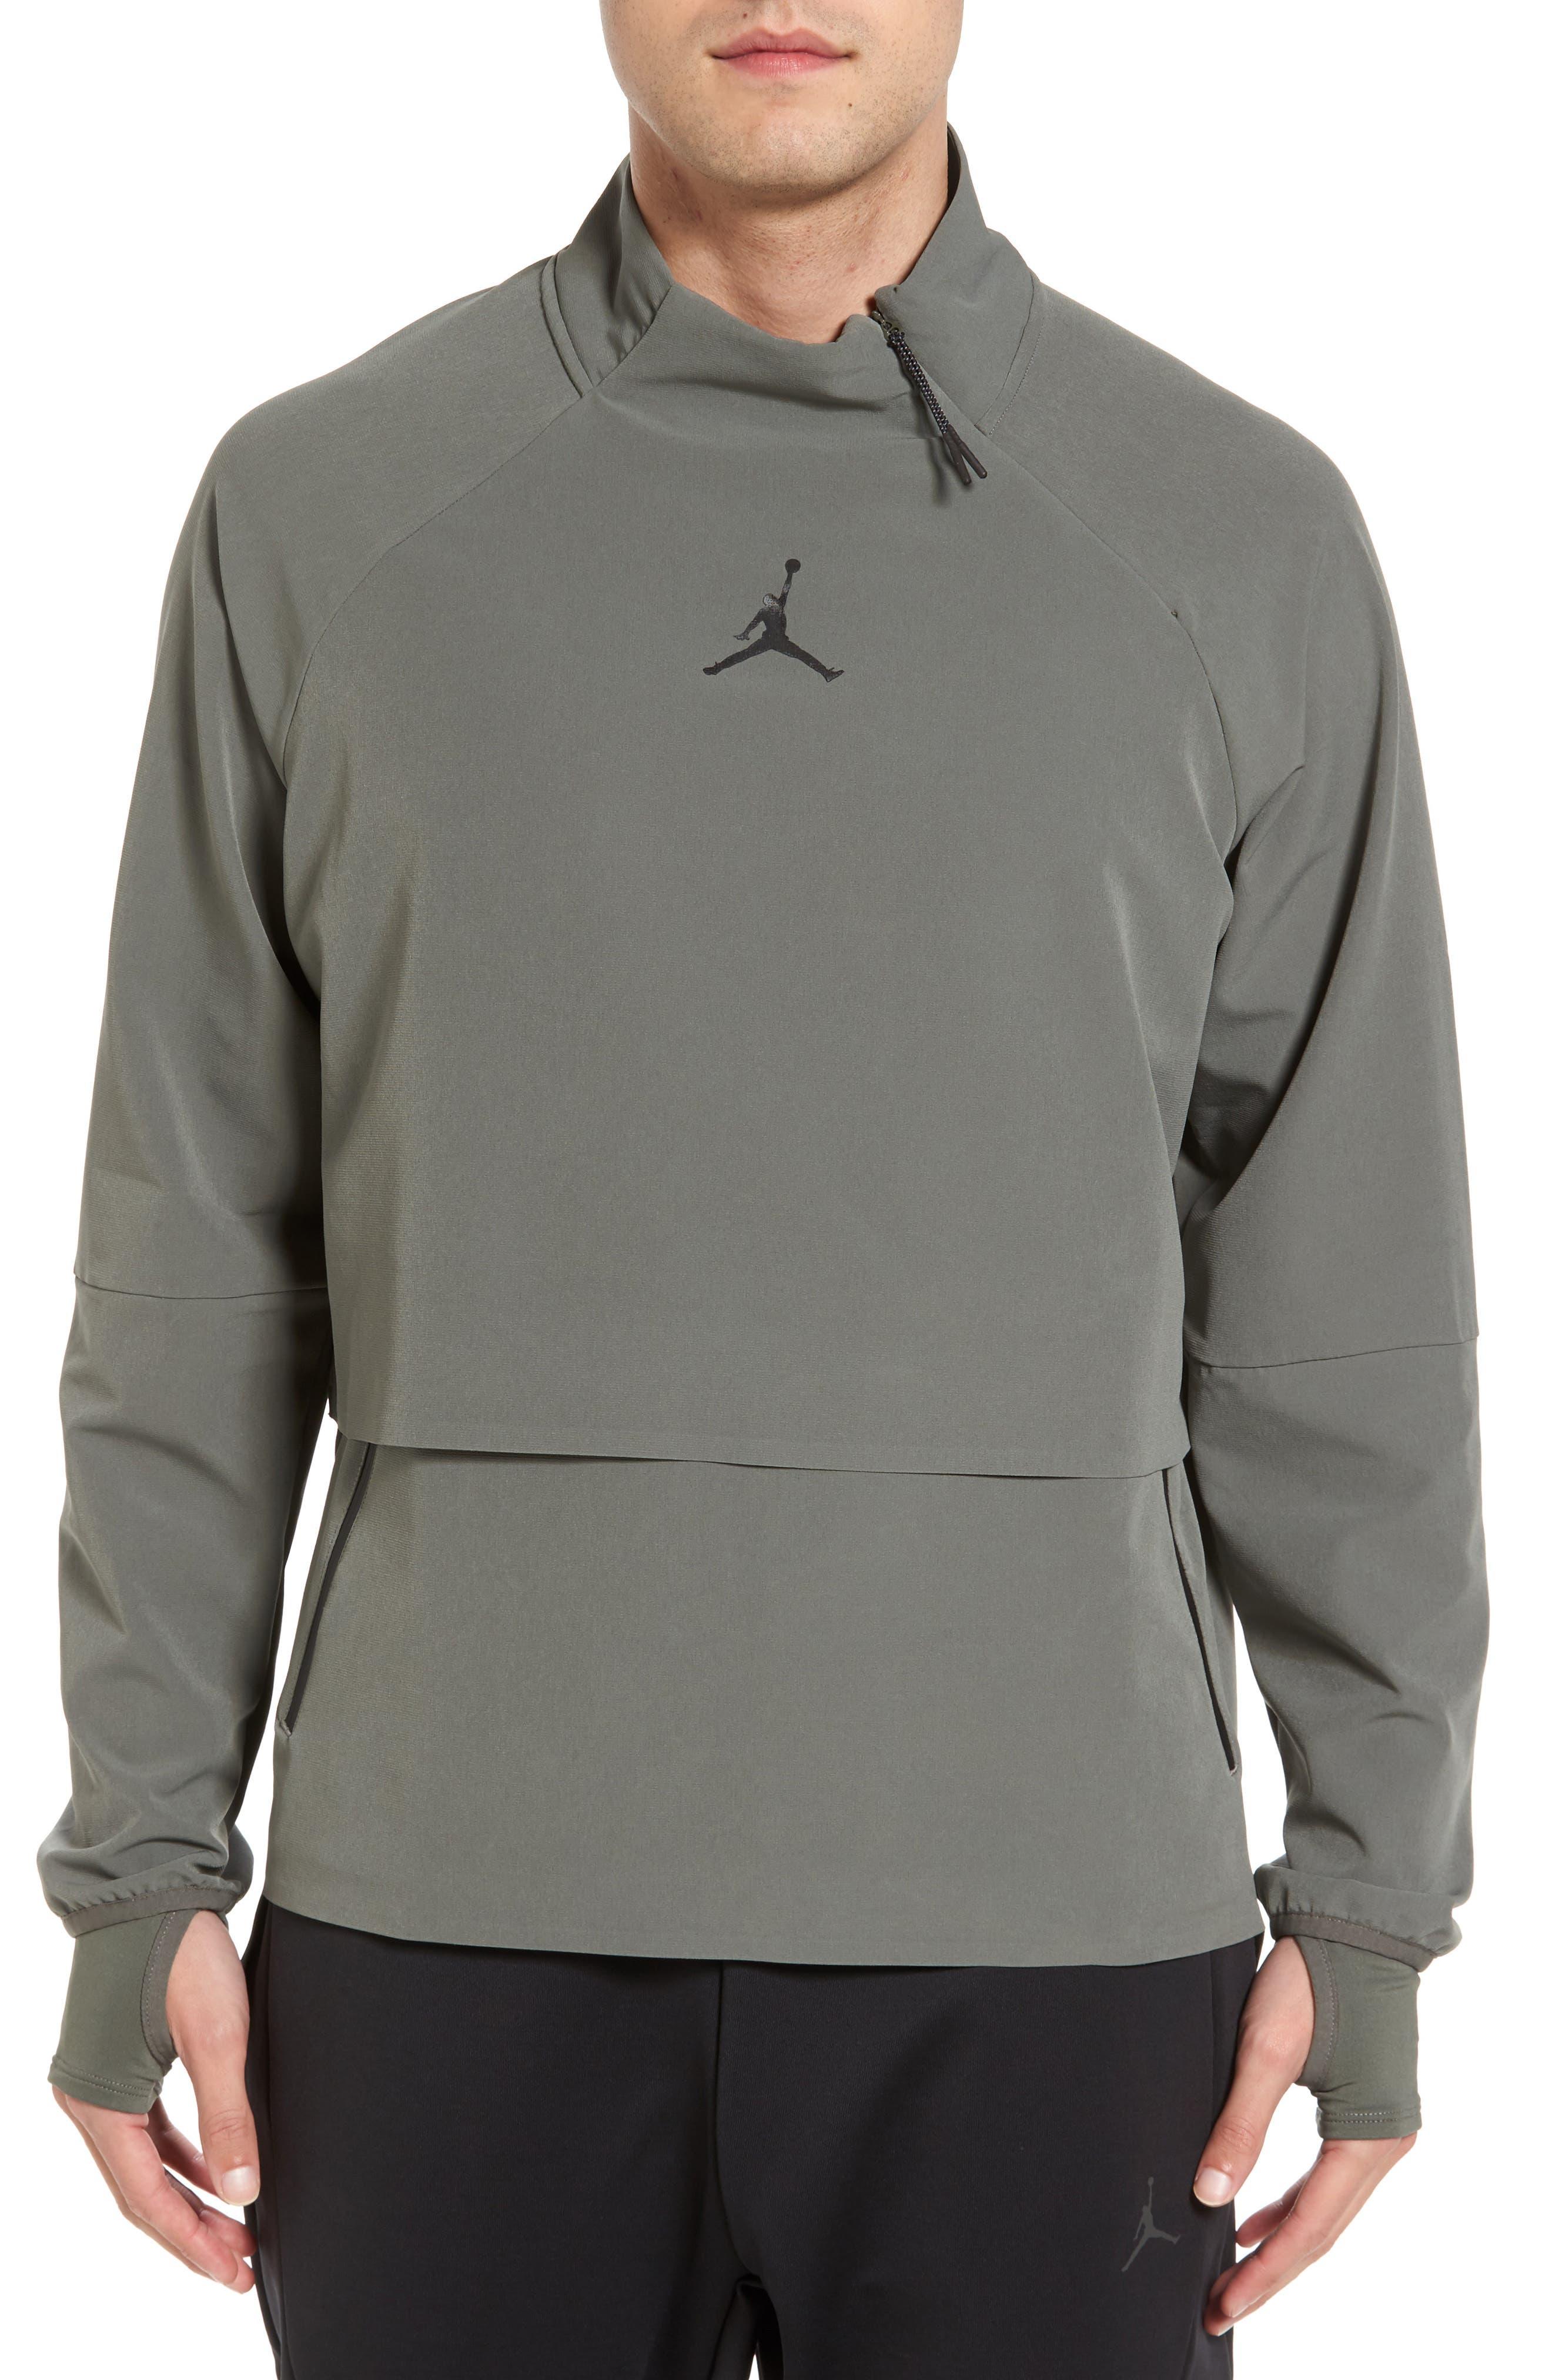 Nike Jordan 23 Tech Shield Jacket